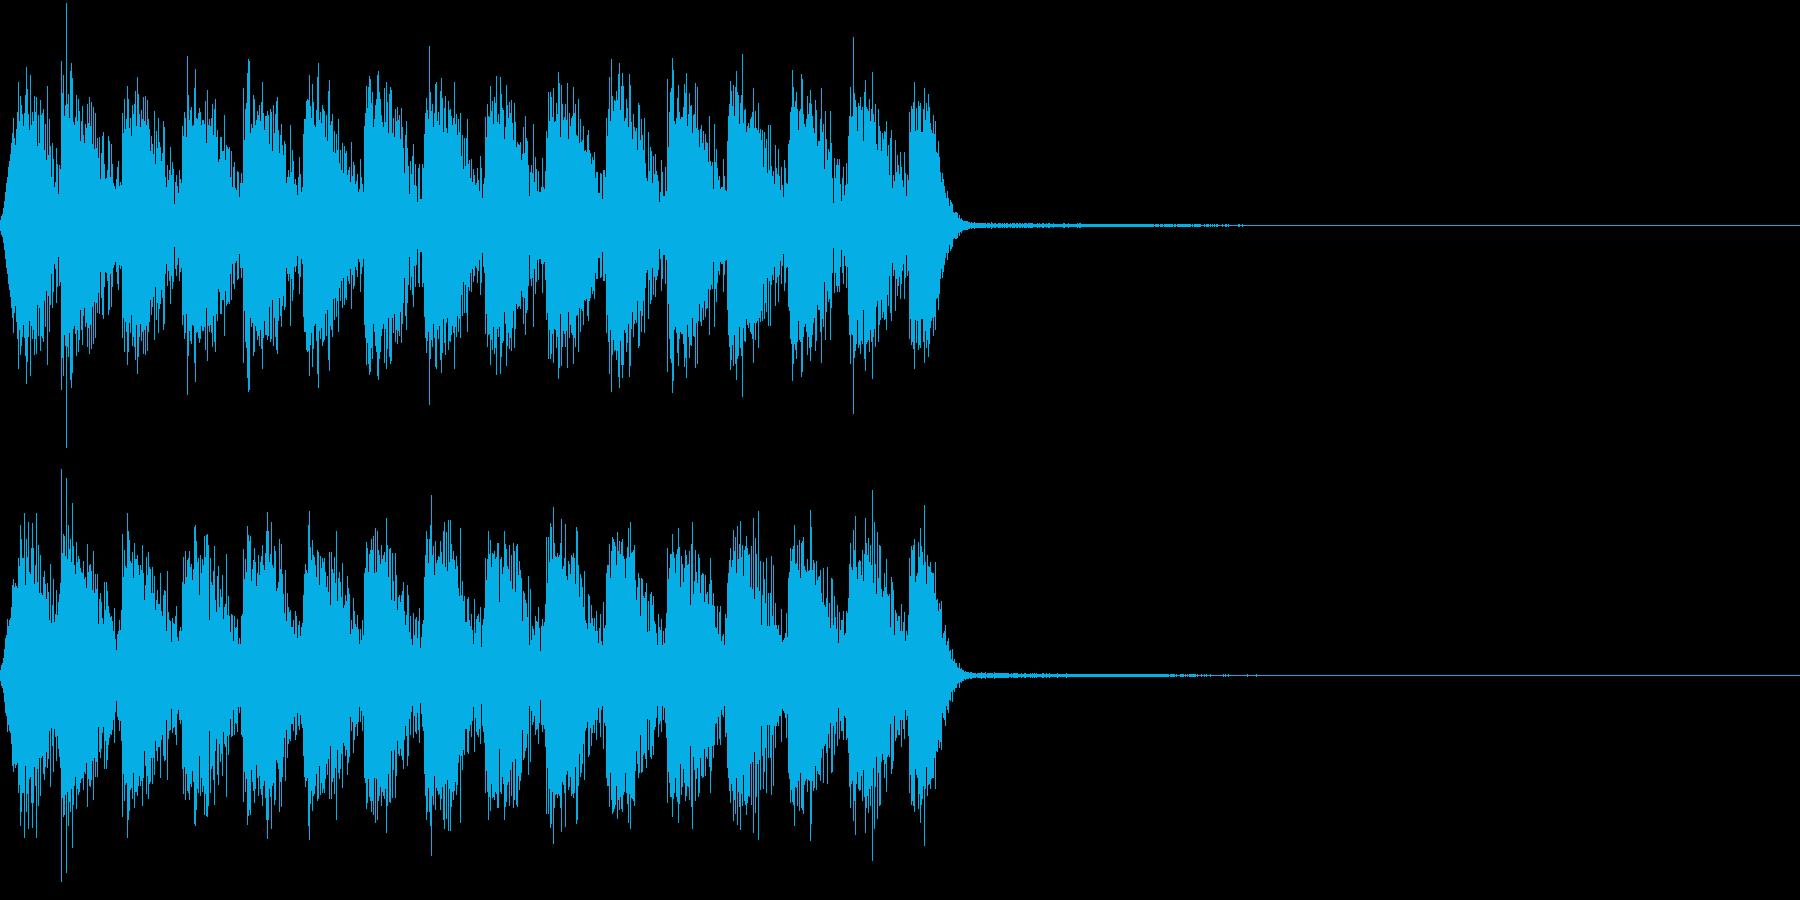 Razor レイザー小銃の連射音 3の再生済みの波形